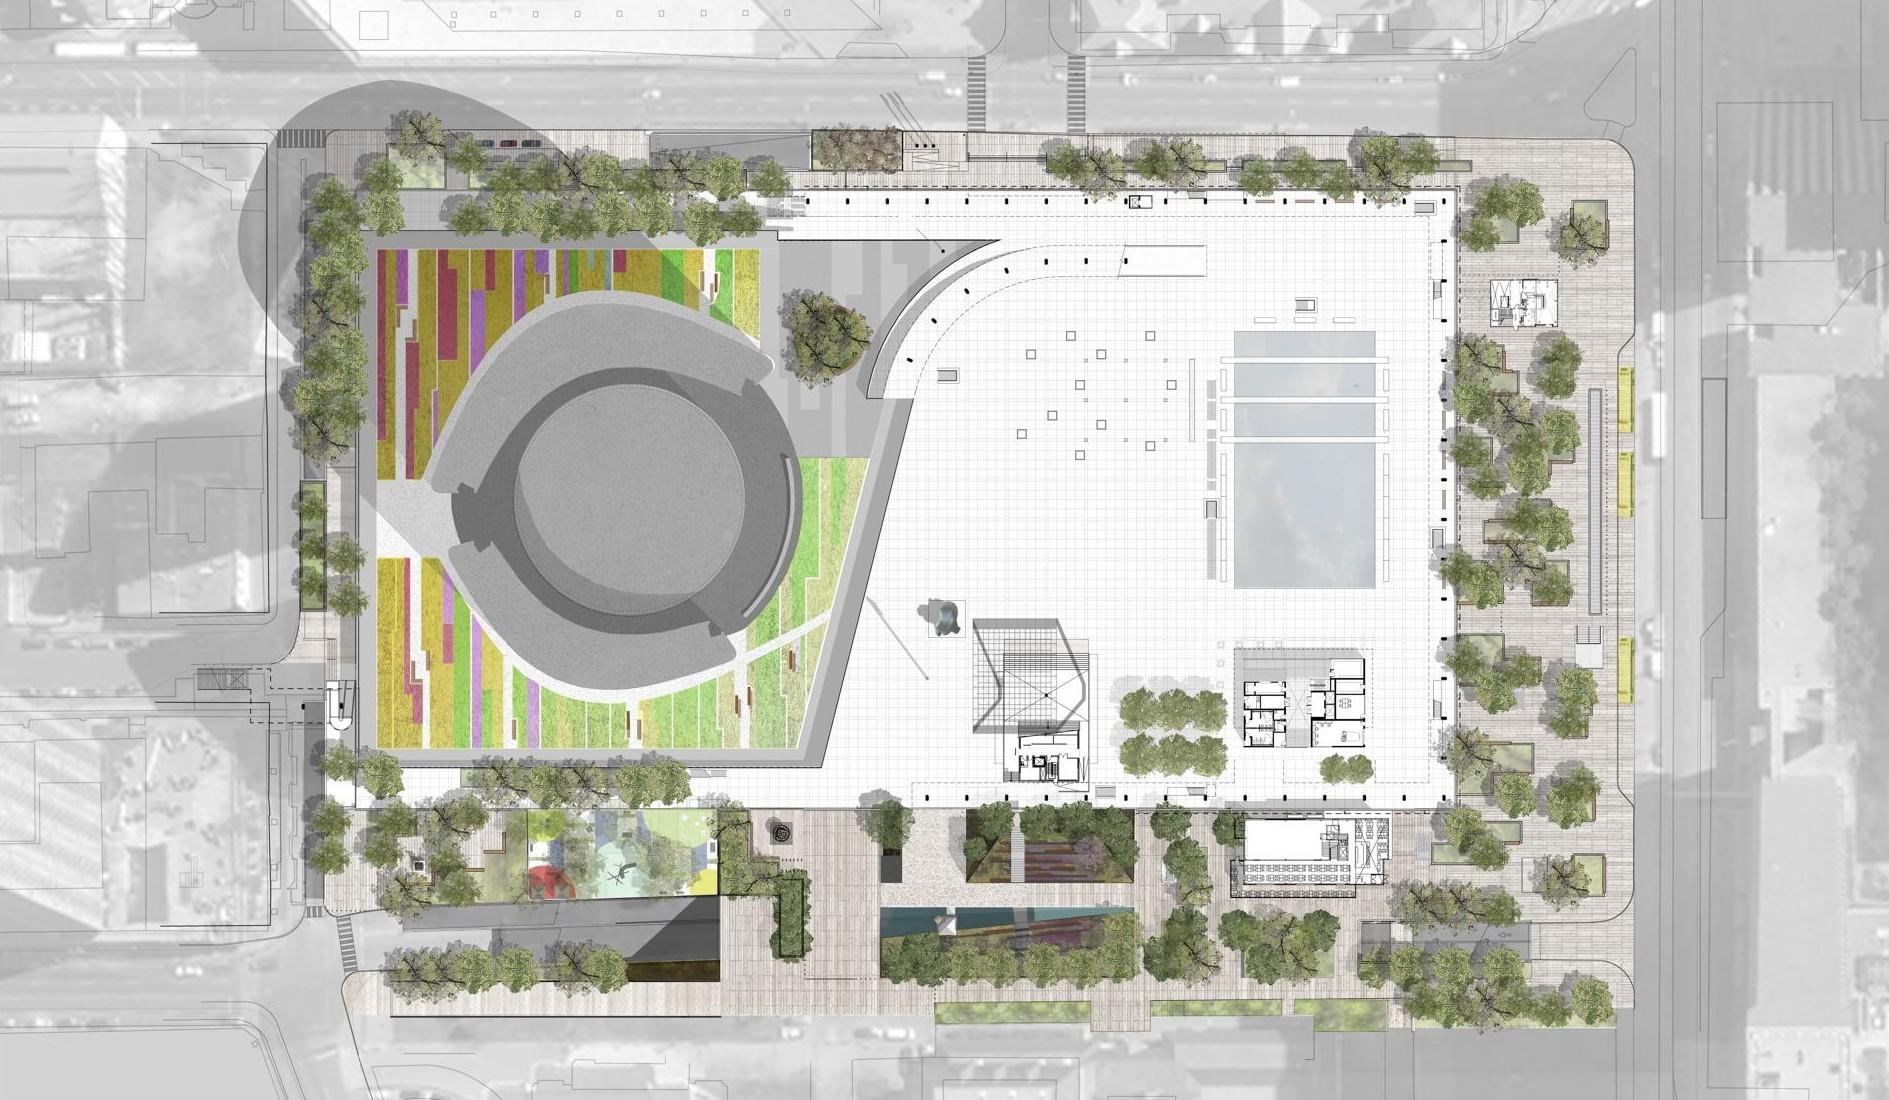 Nathan Phillips Square Podium Green Roof Garden Csla